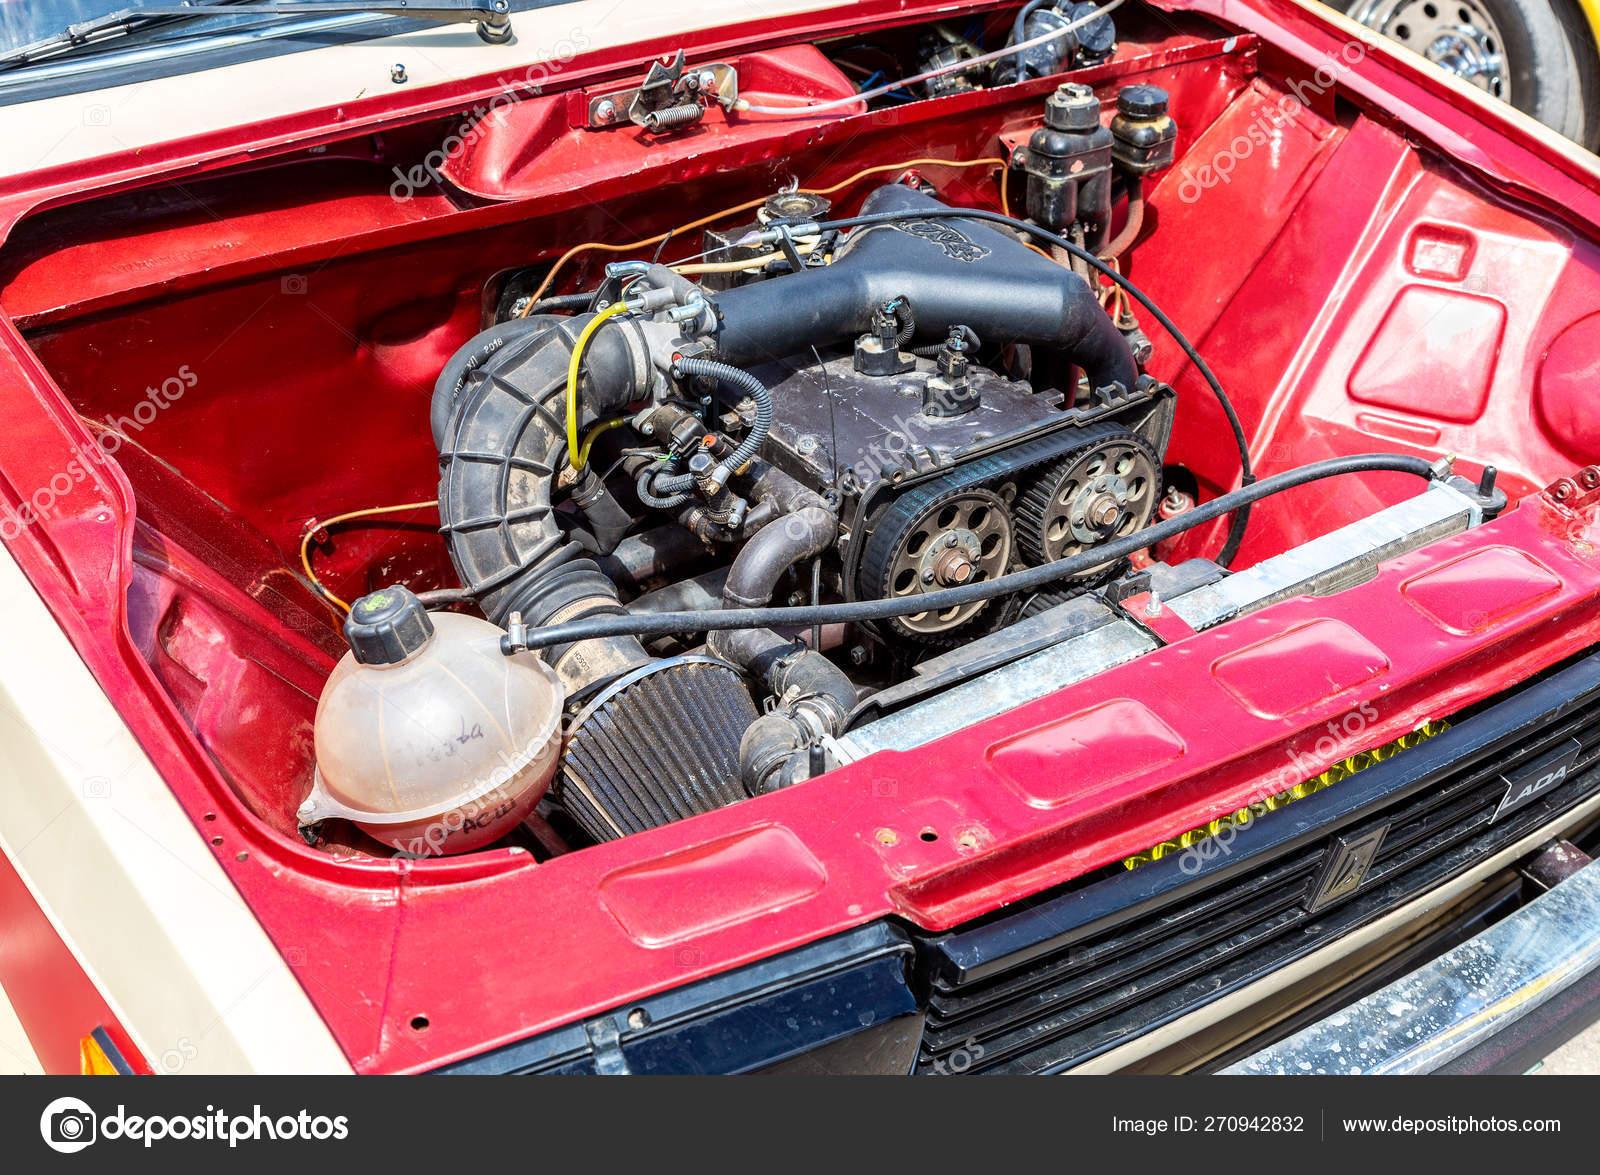 Tuned Turbo Car Engine Of Lada Car Stock Editorial Photo C Blinow61 270942832